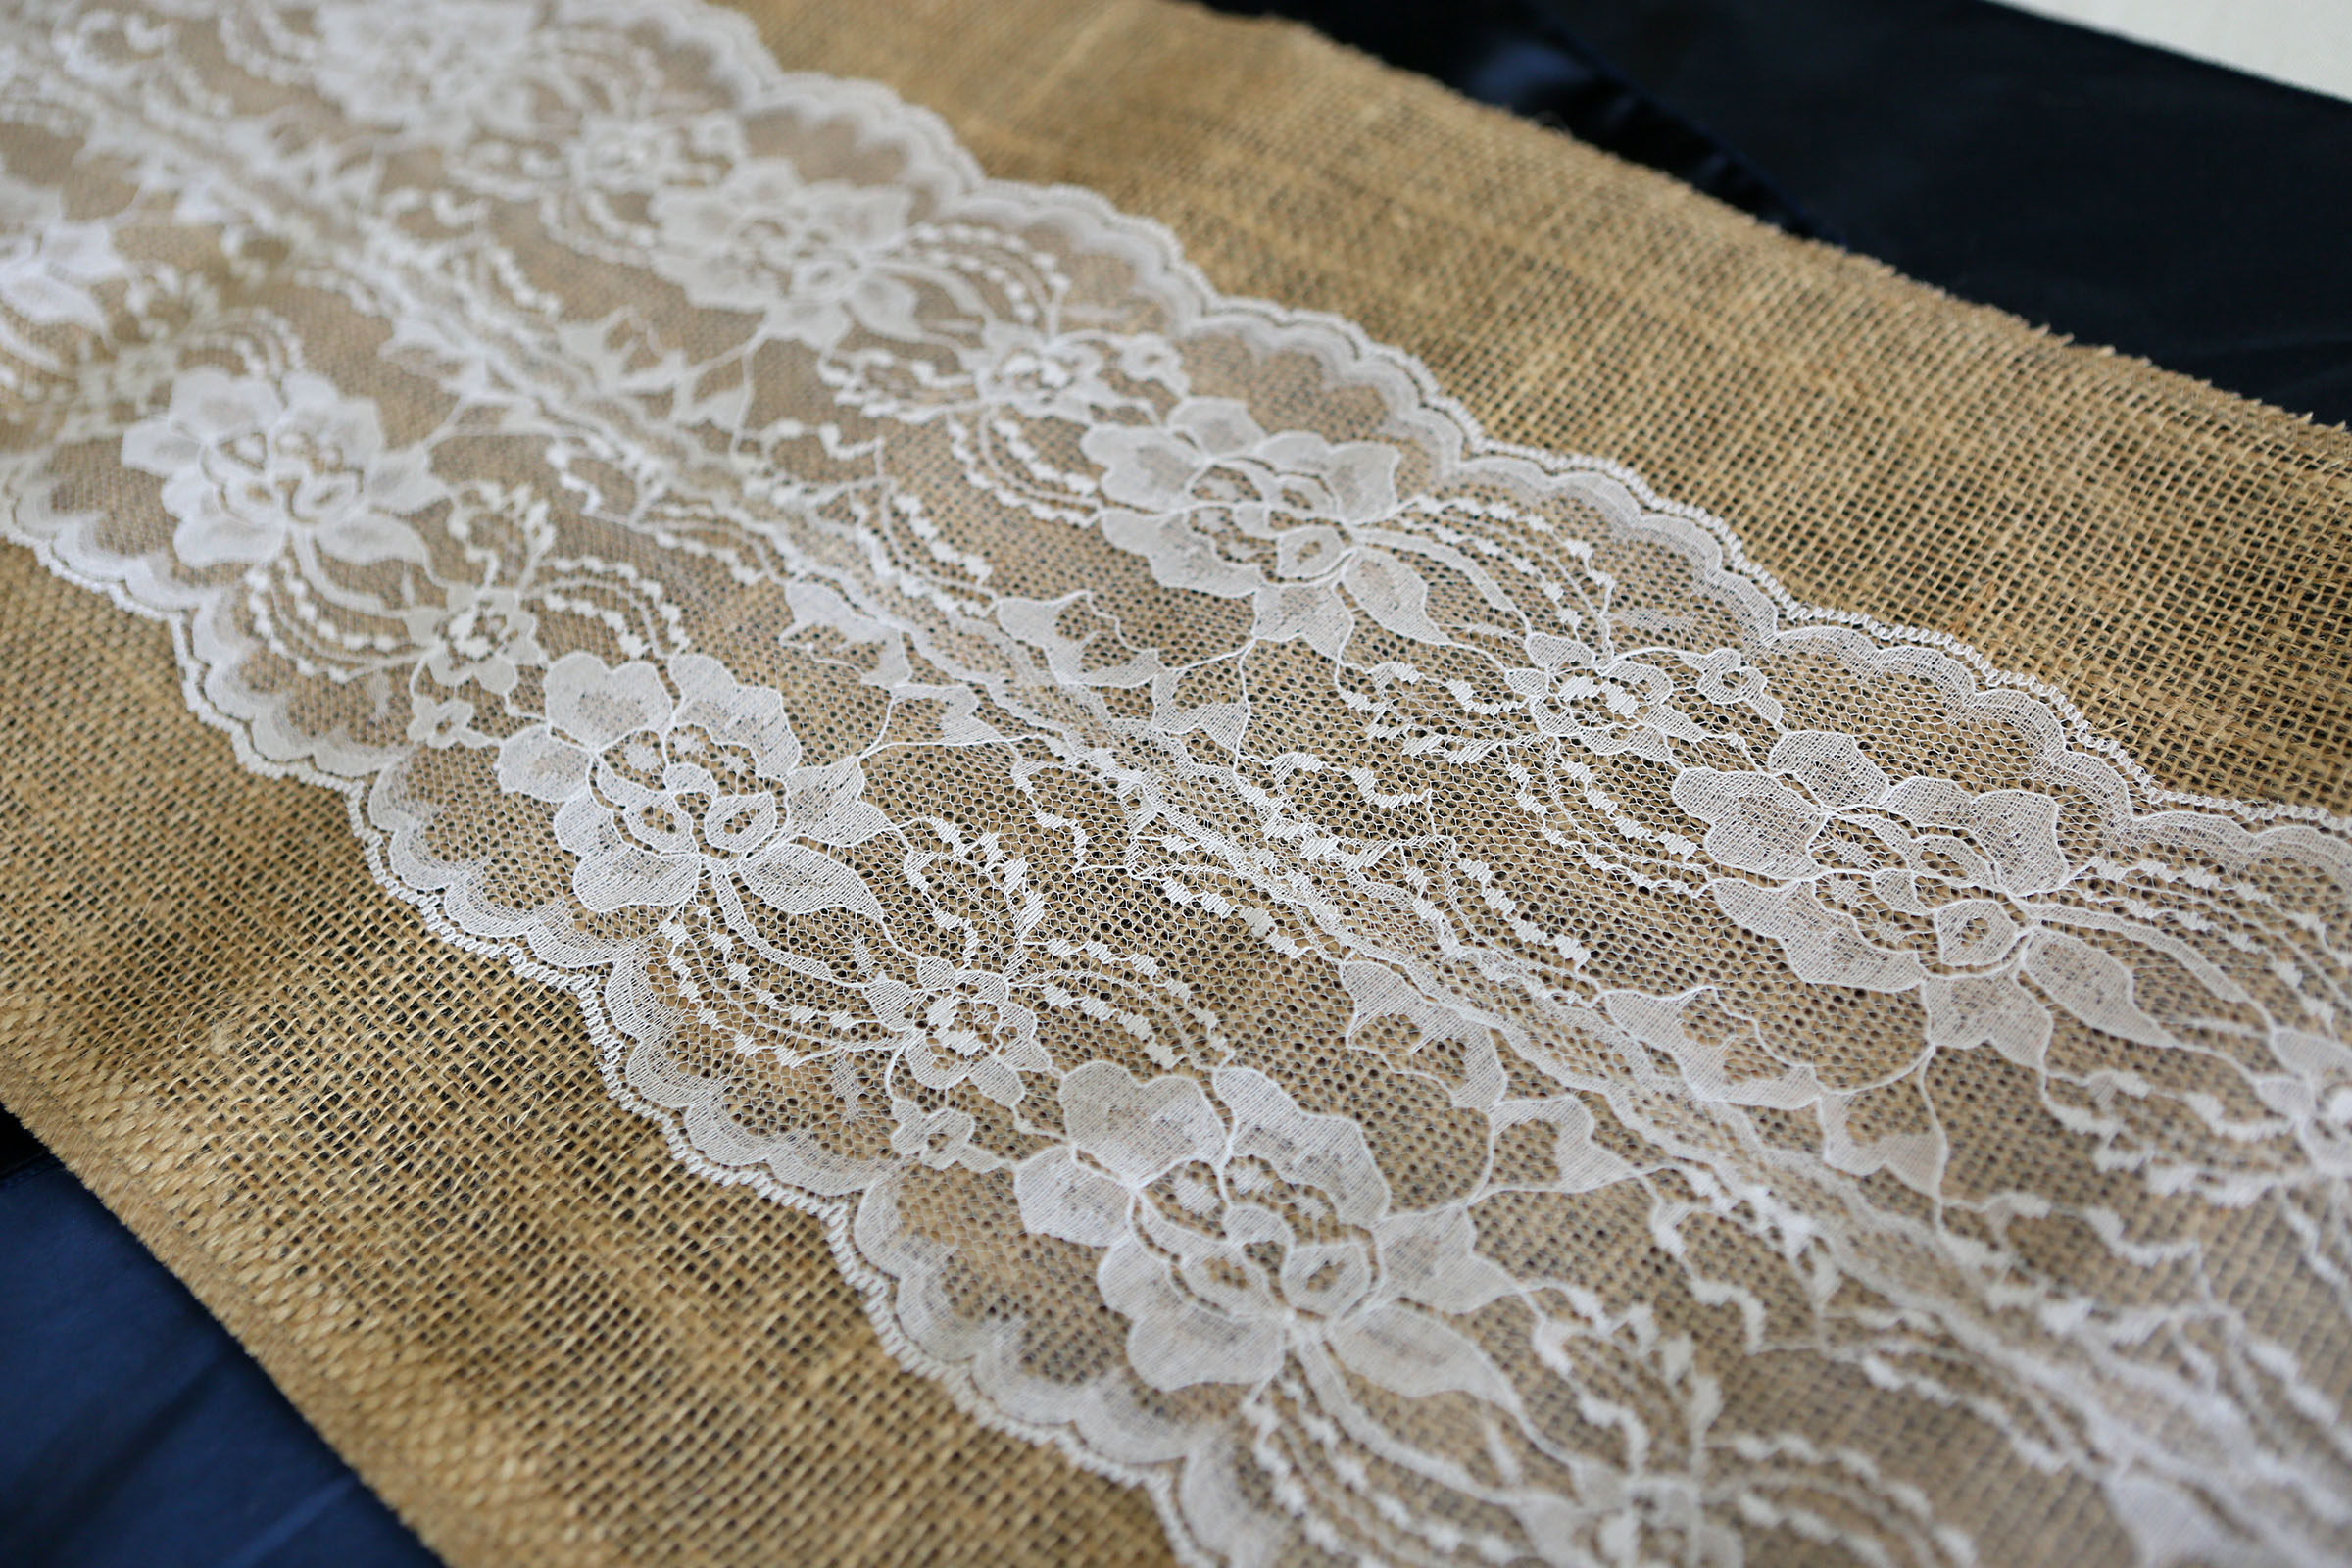 Burlap and Lace  BurlapFabriccom Burlap fabric for